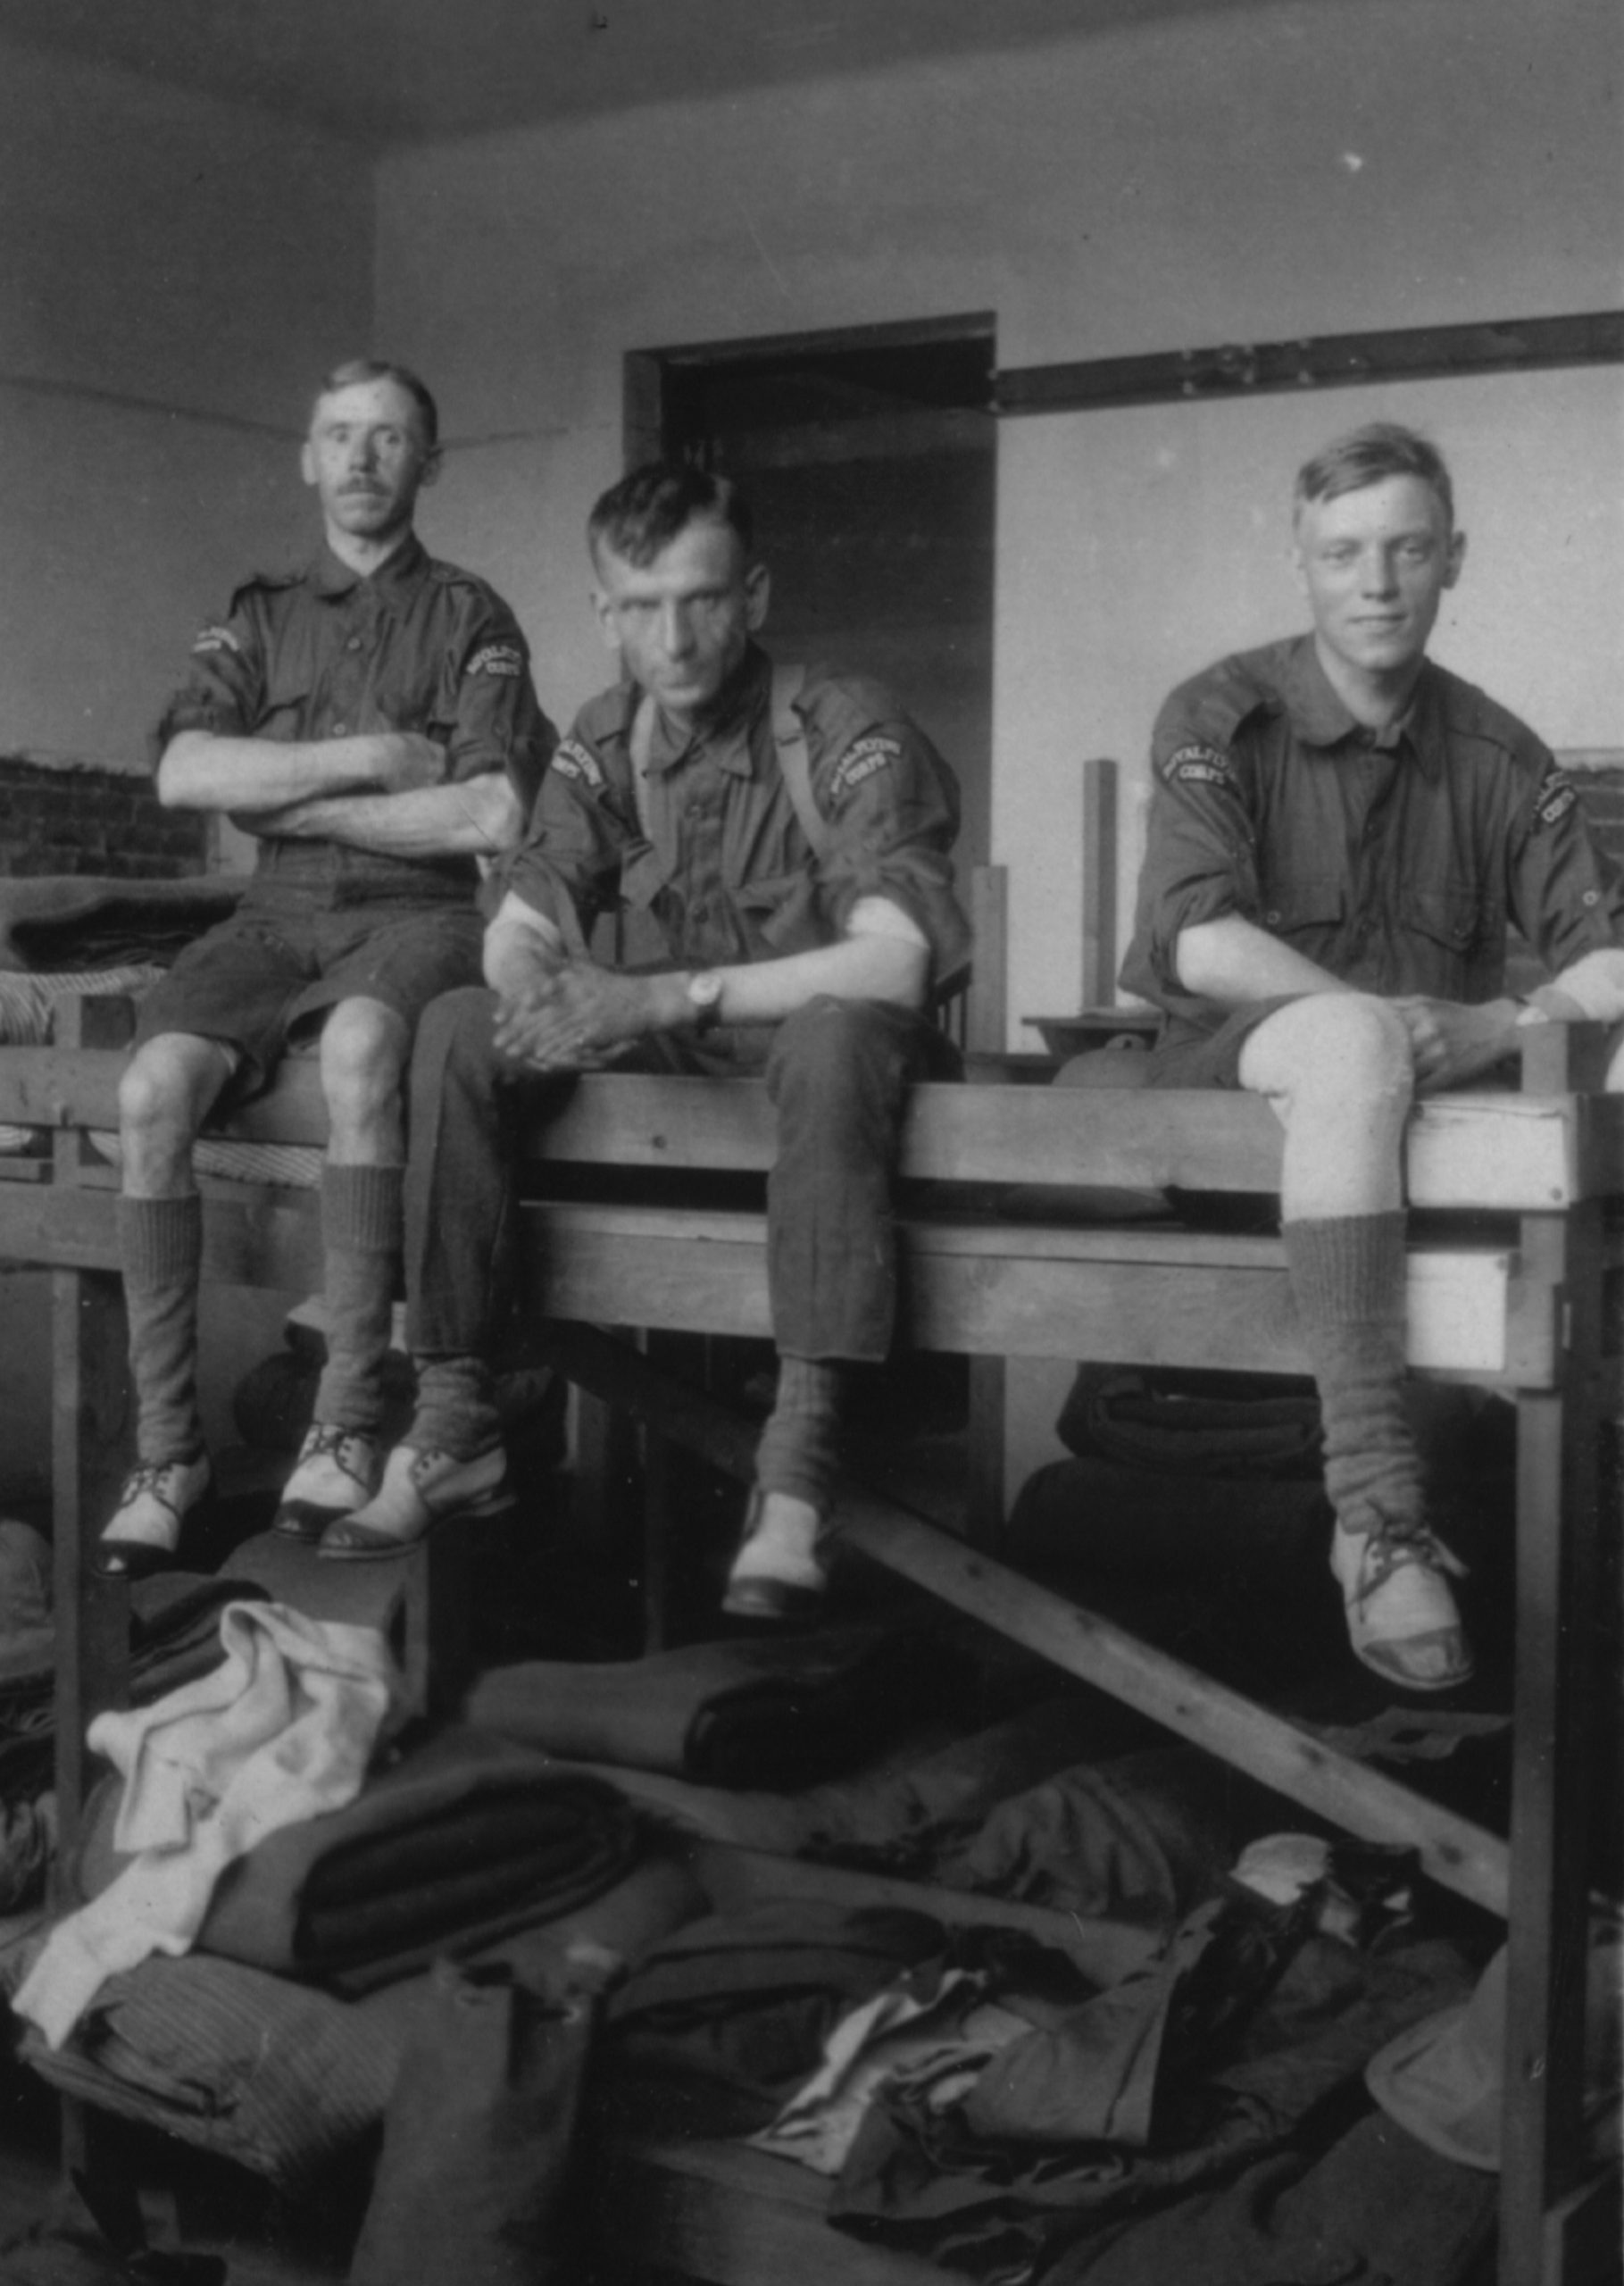 First WW servicemen in barracks